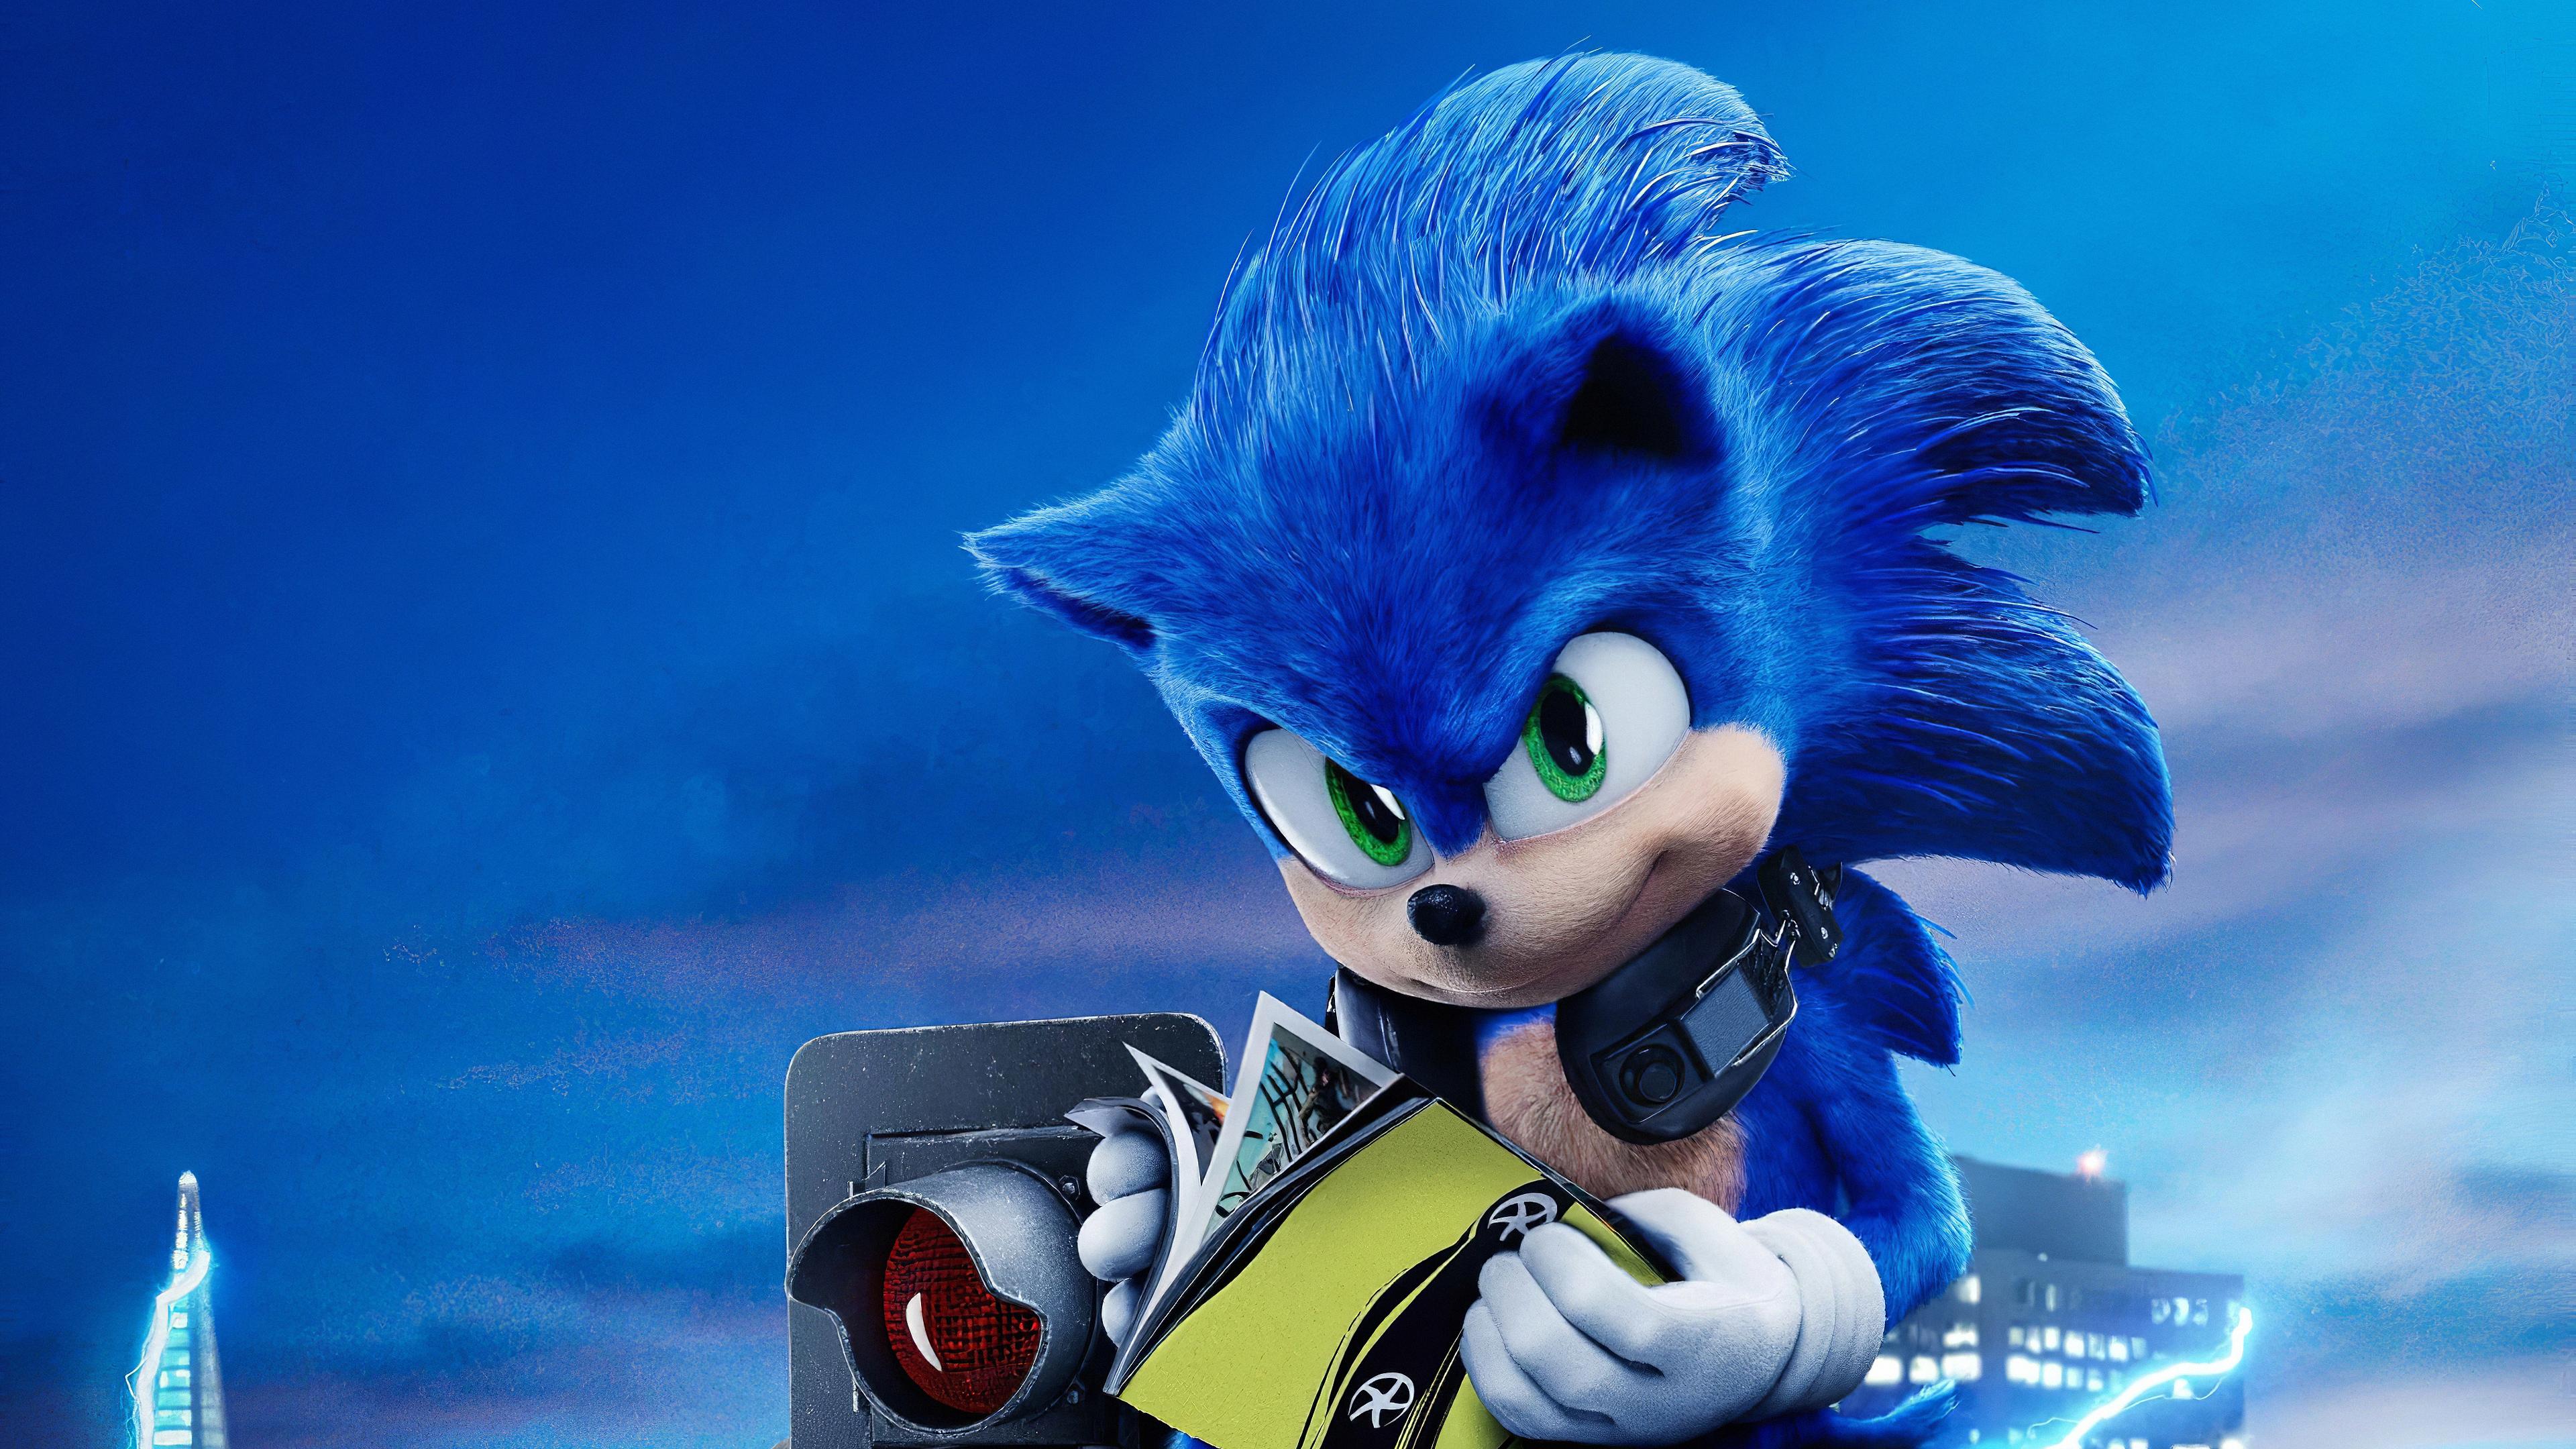 Sonic The Hedgehog 2020 Sonic The Hedgehog 3840x2160 Download Hd Wallpaper Wallpapertip